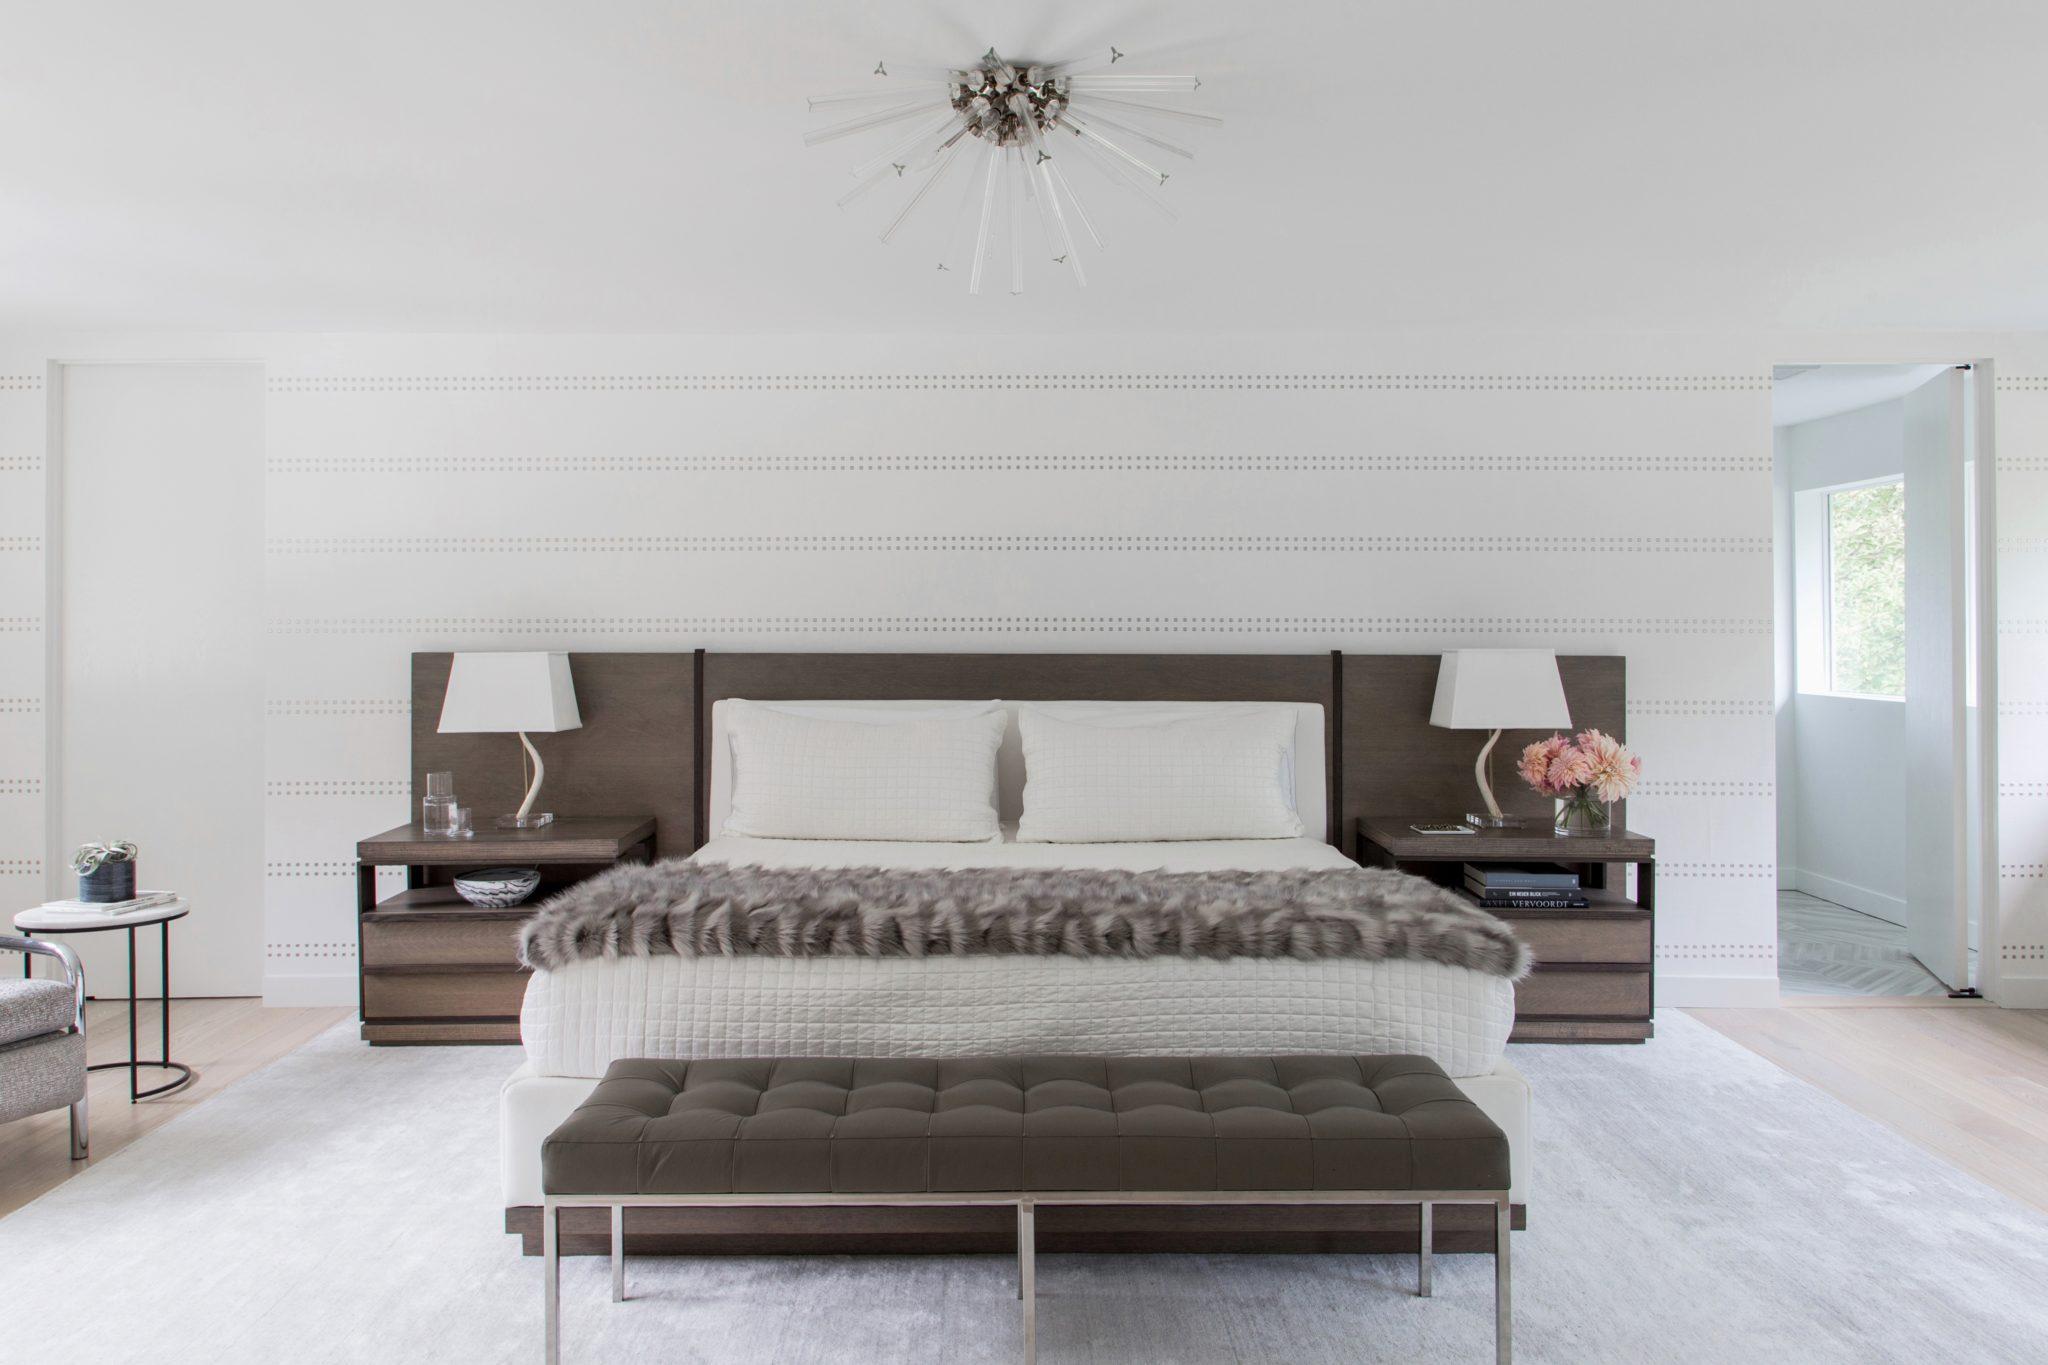 Stylish Bedrooms With Oversized Headboards Chairish Blog